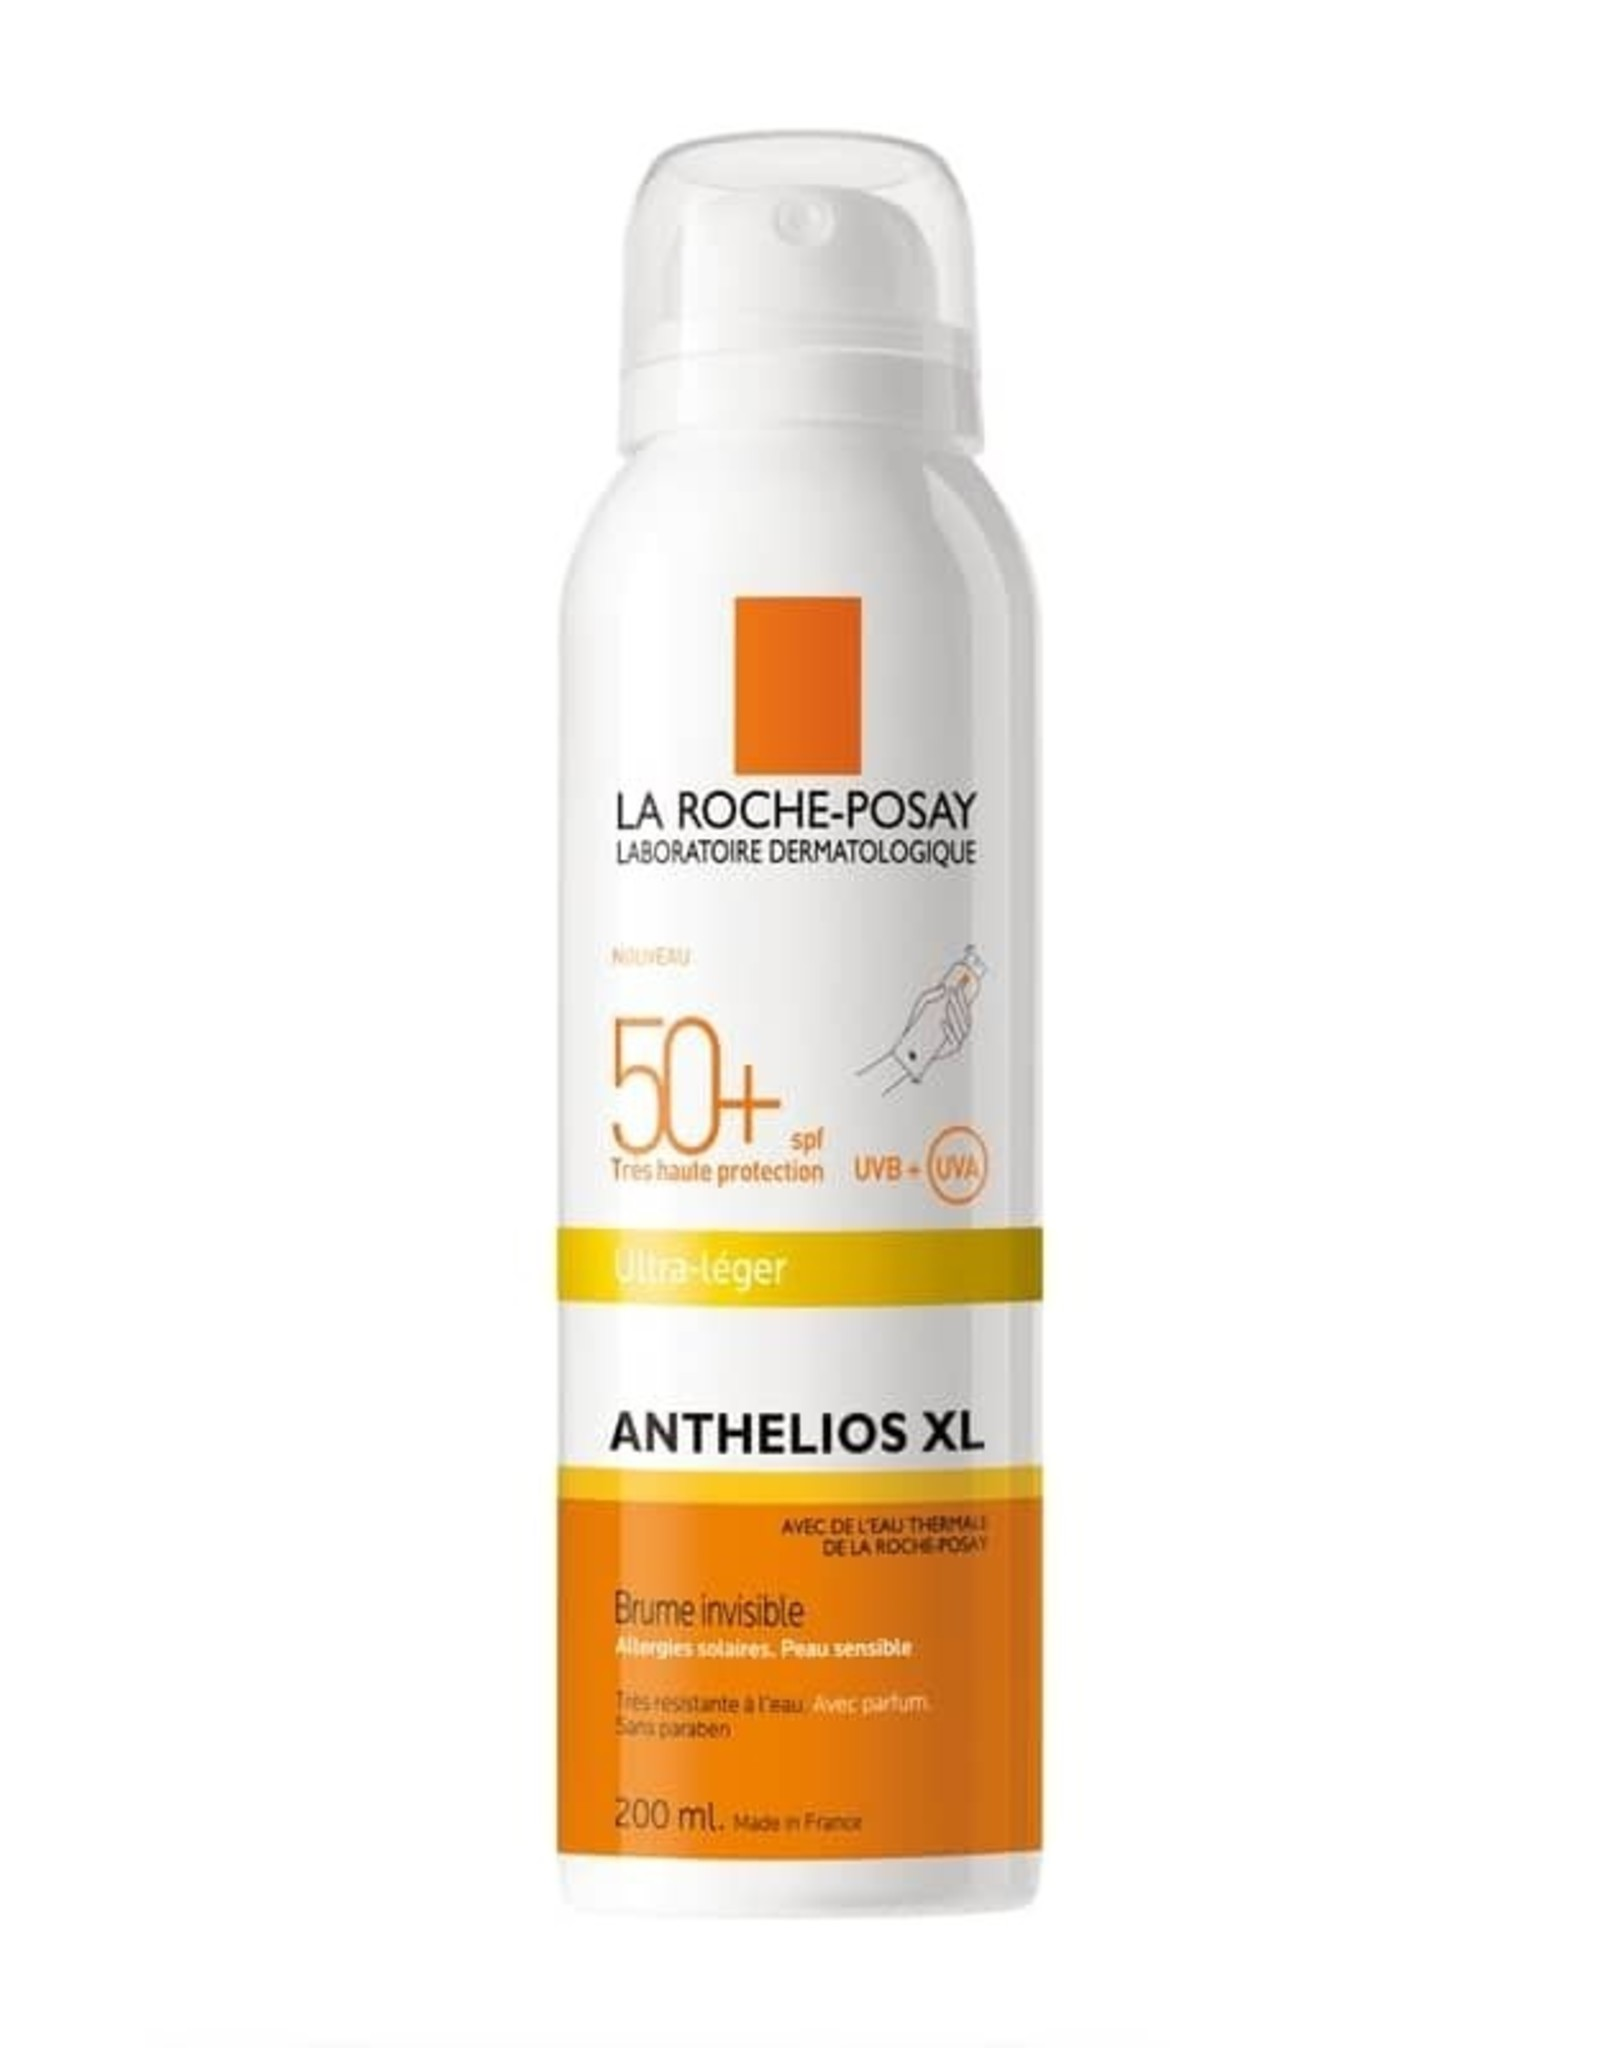 La Roche Posay Anthelios XL Lichaamsmist SPF 50 200ml